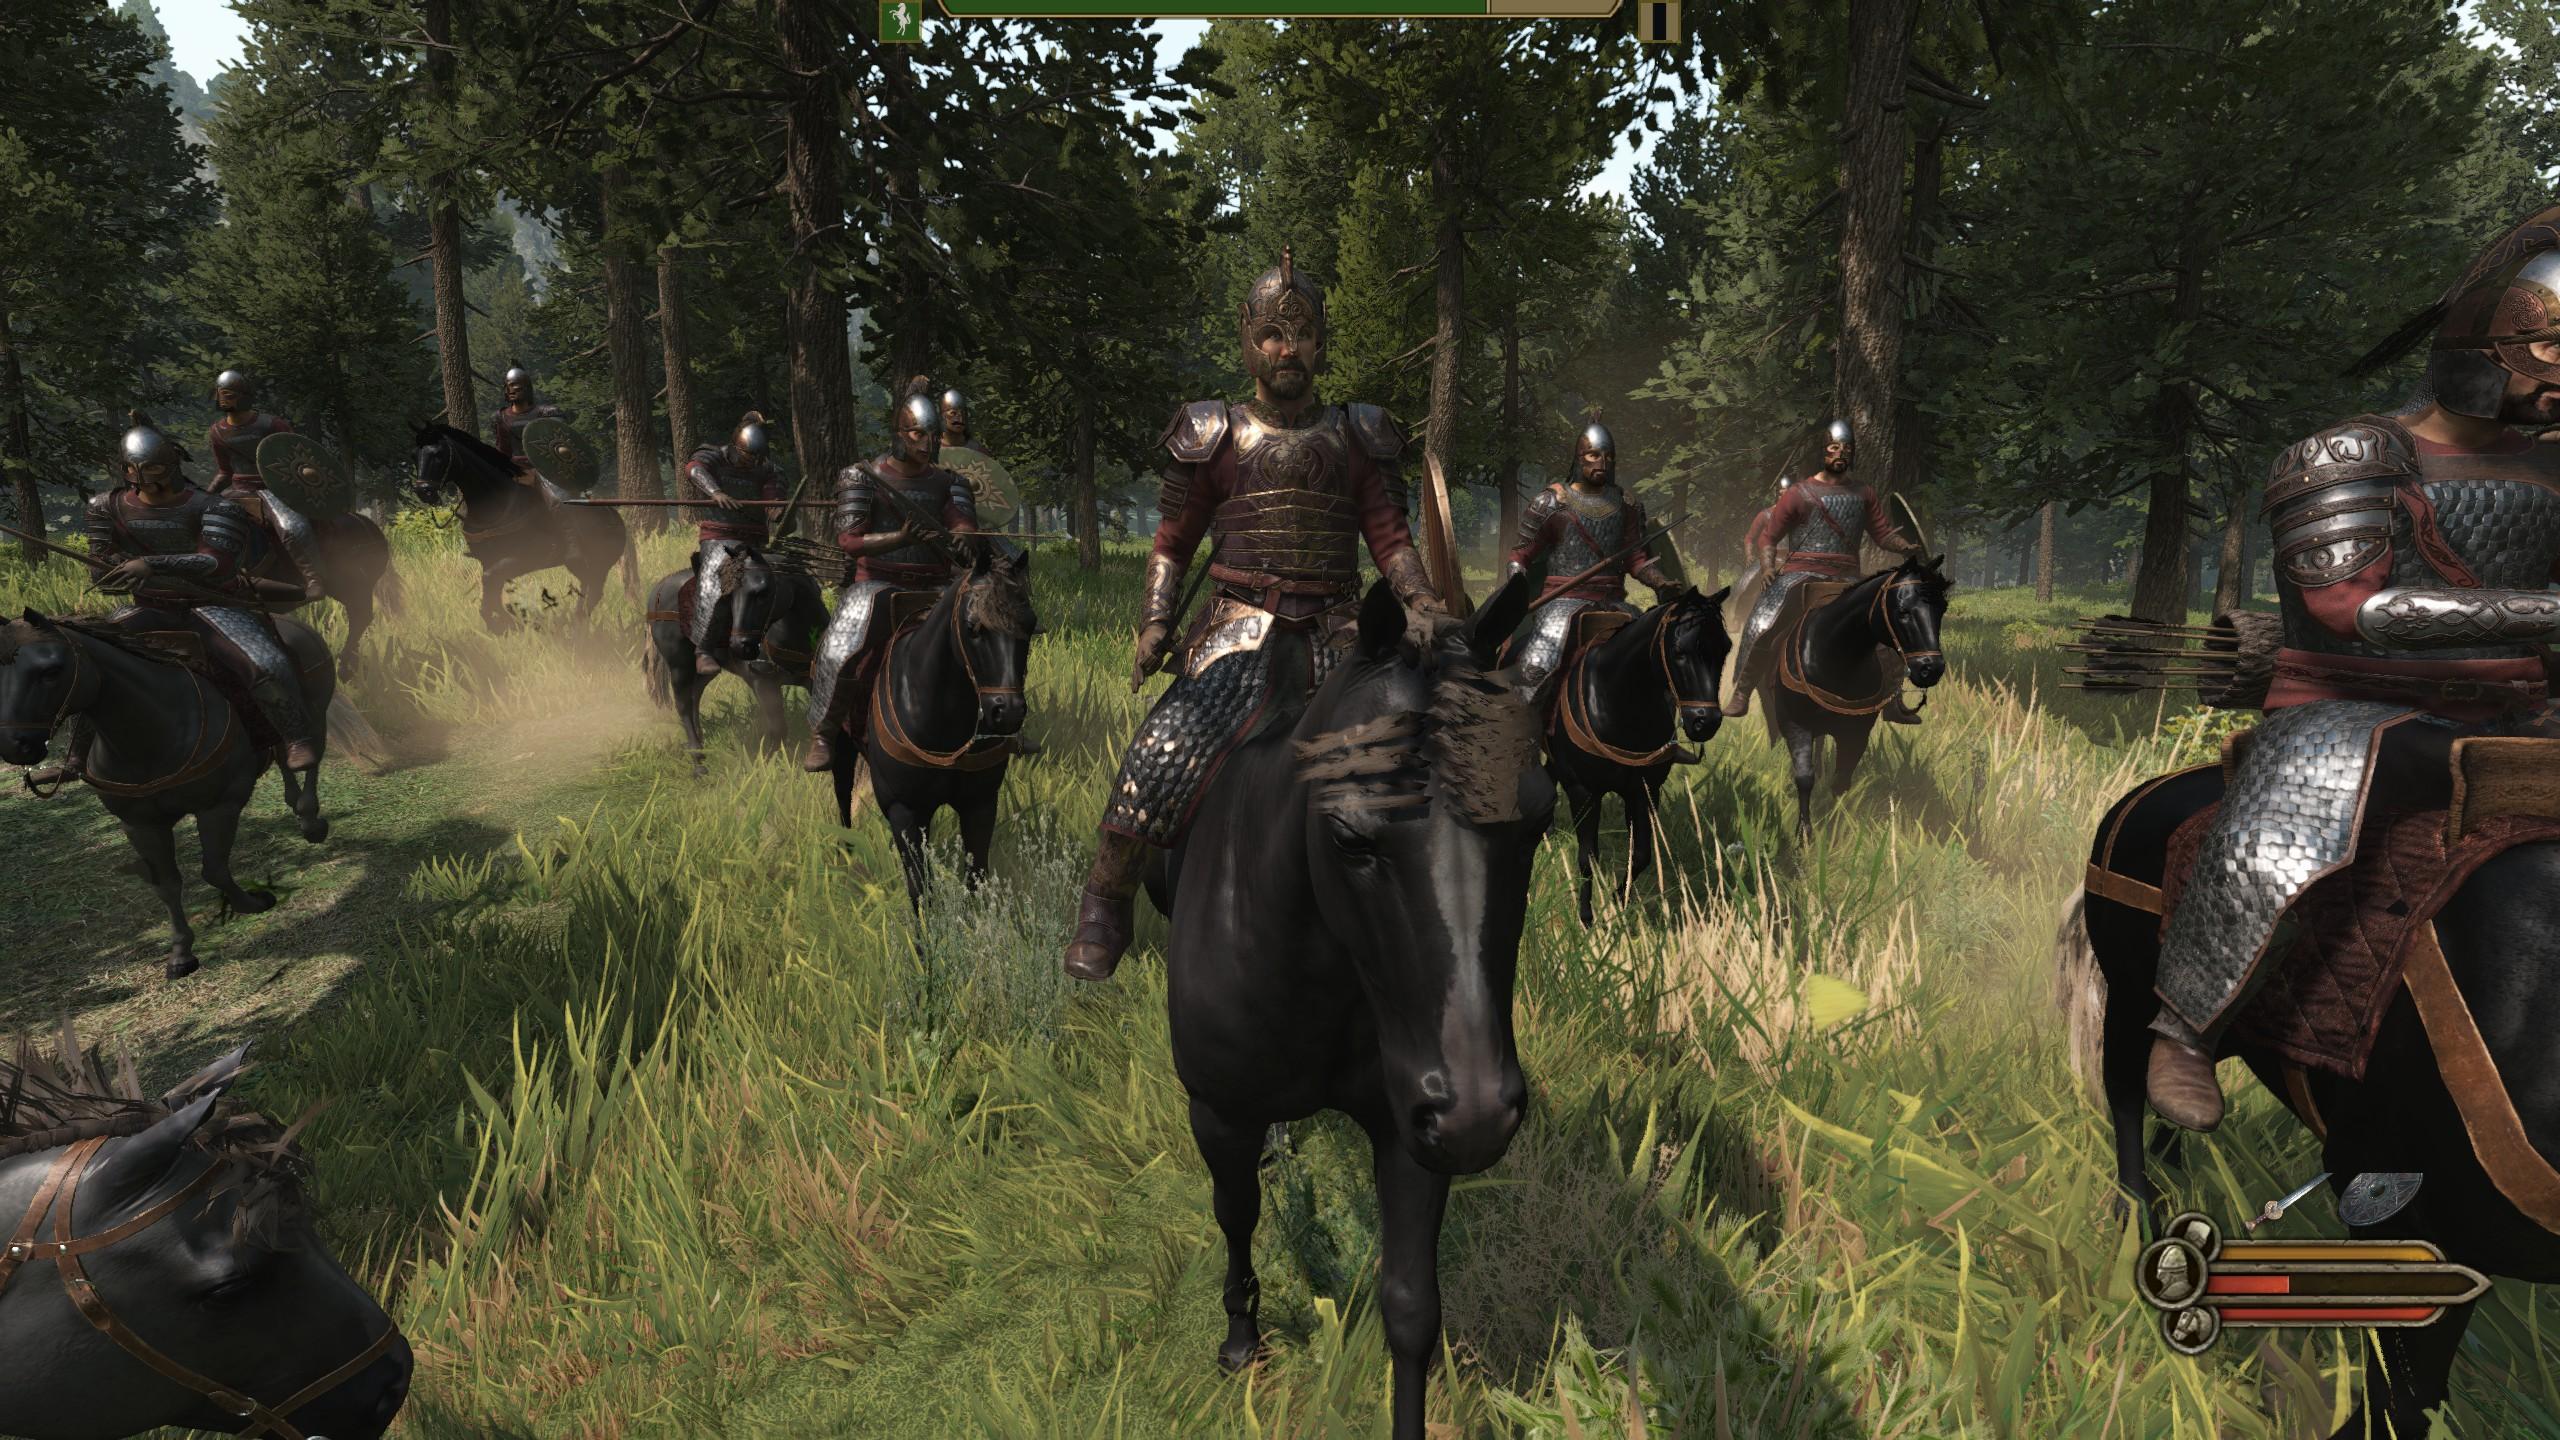 King_Theoden_and_his_Royal_Guard.jpg